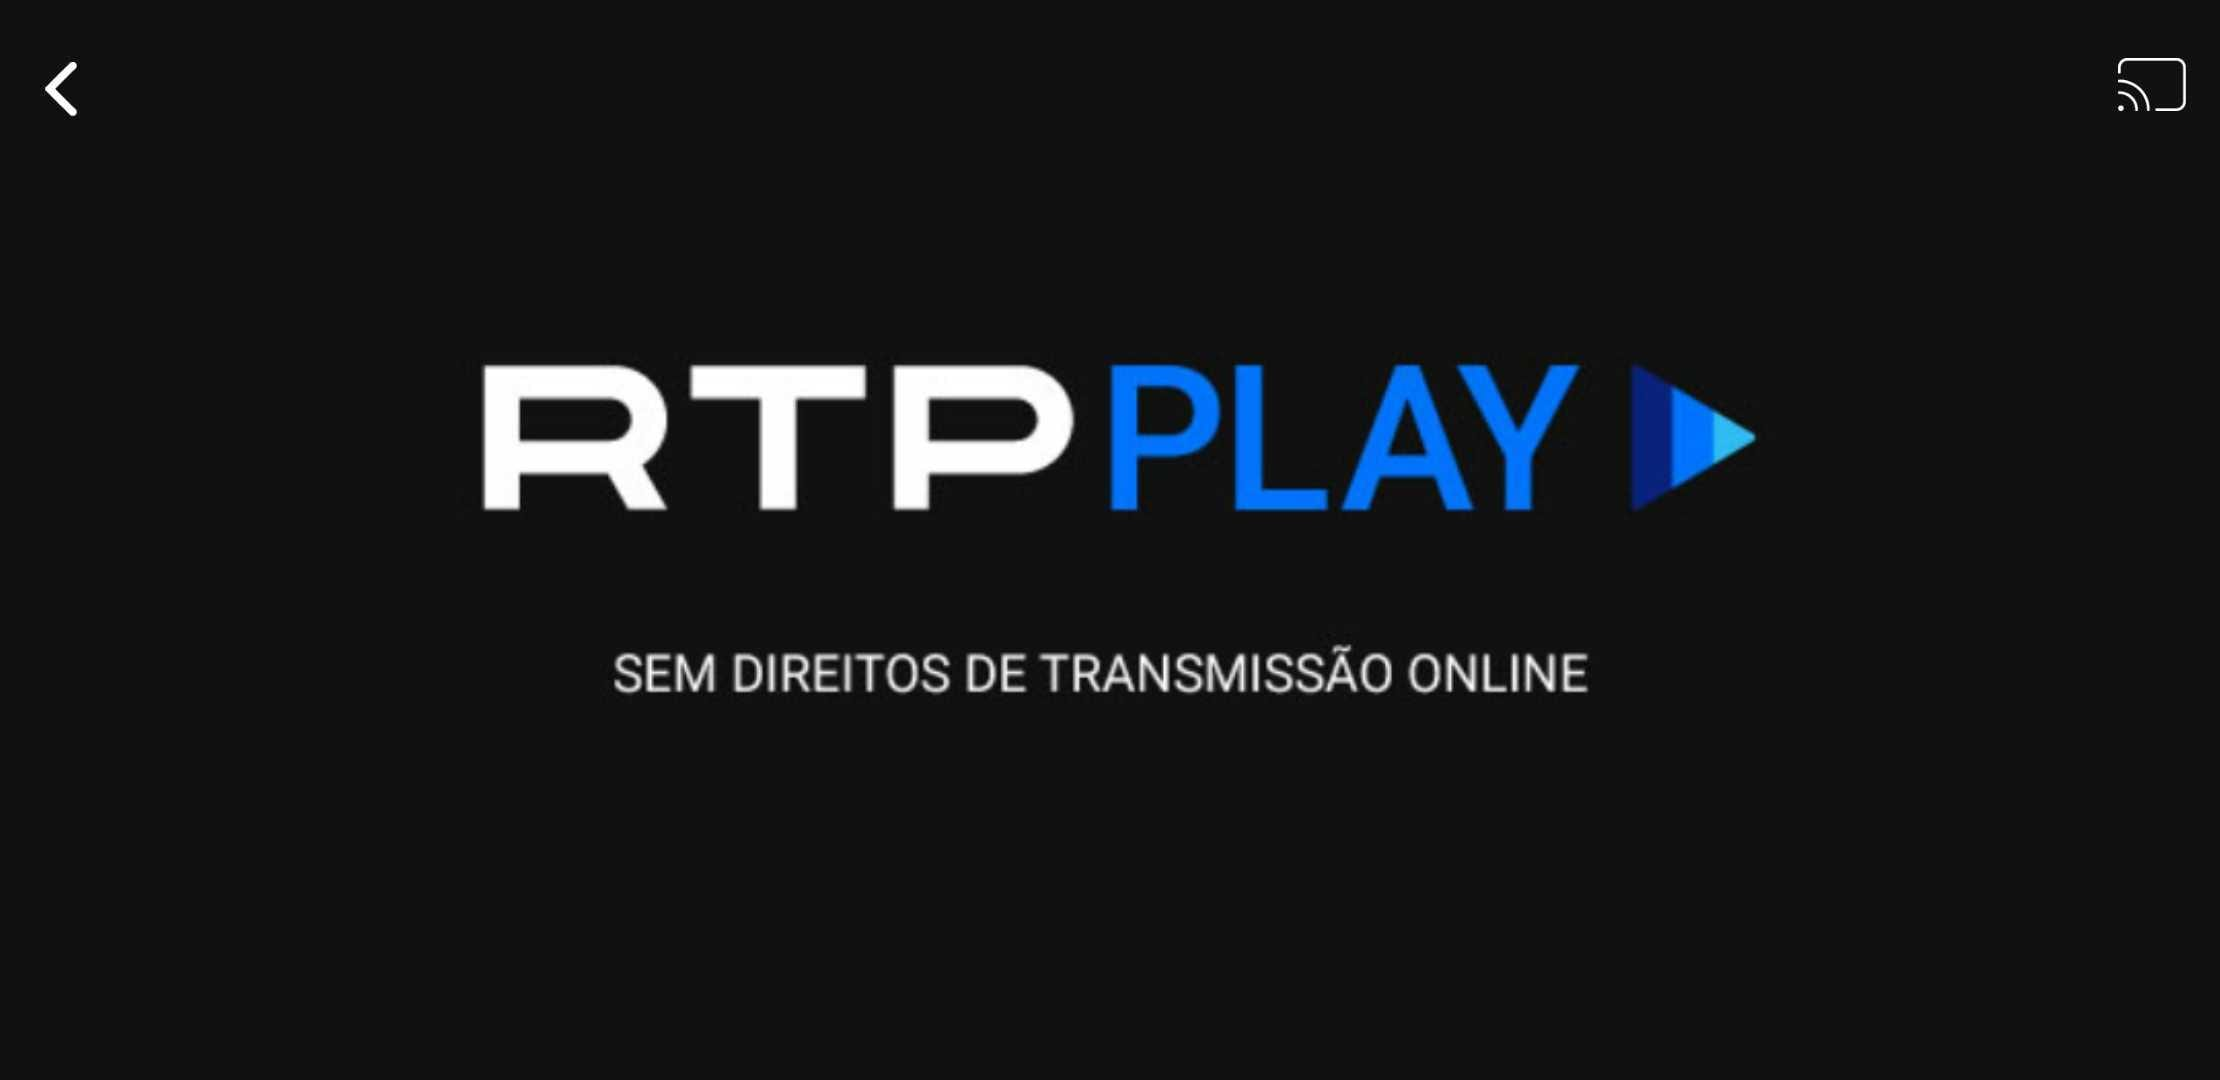 RTP Play Error